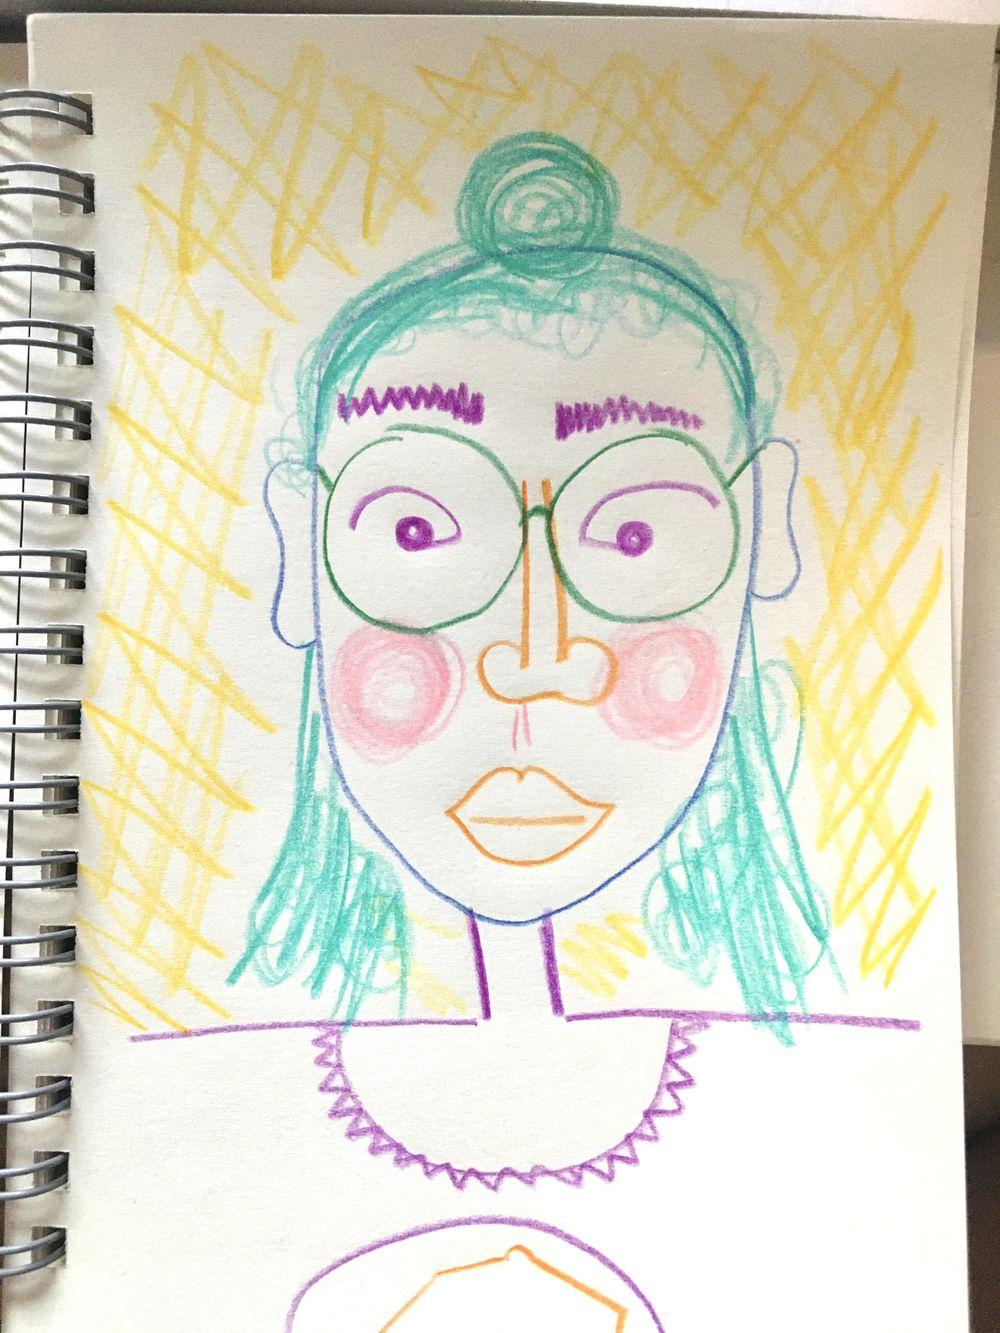 self-portraits - image 1 - student project